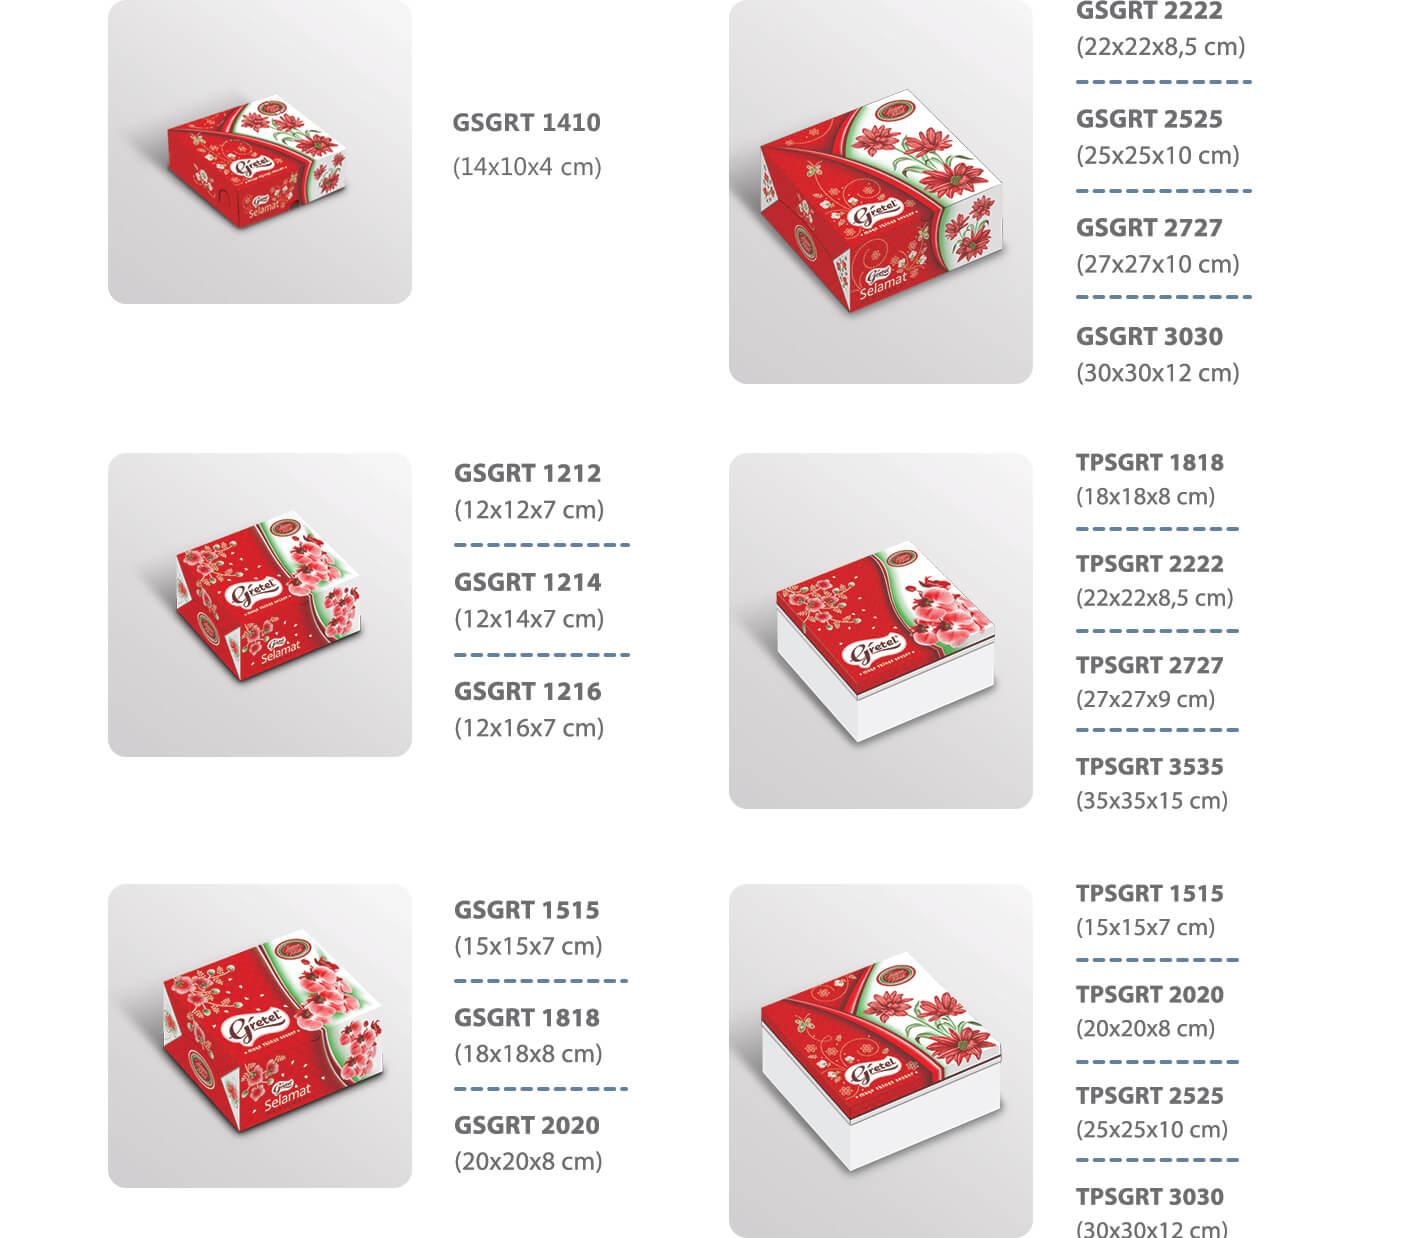 dus kue, dus roti, dus snack, snack box, box kue, kotak kue, box roti - gretel